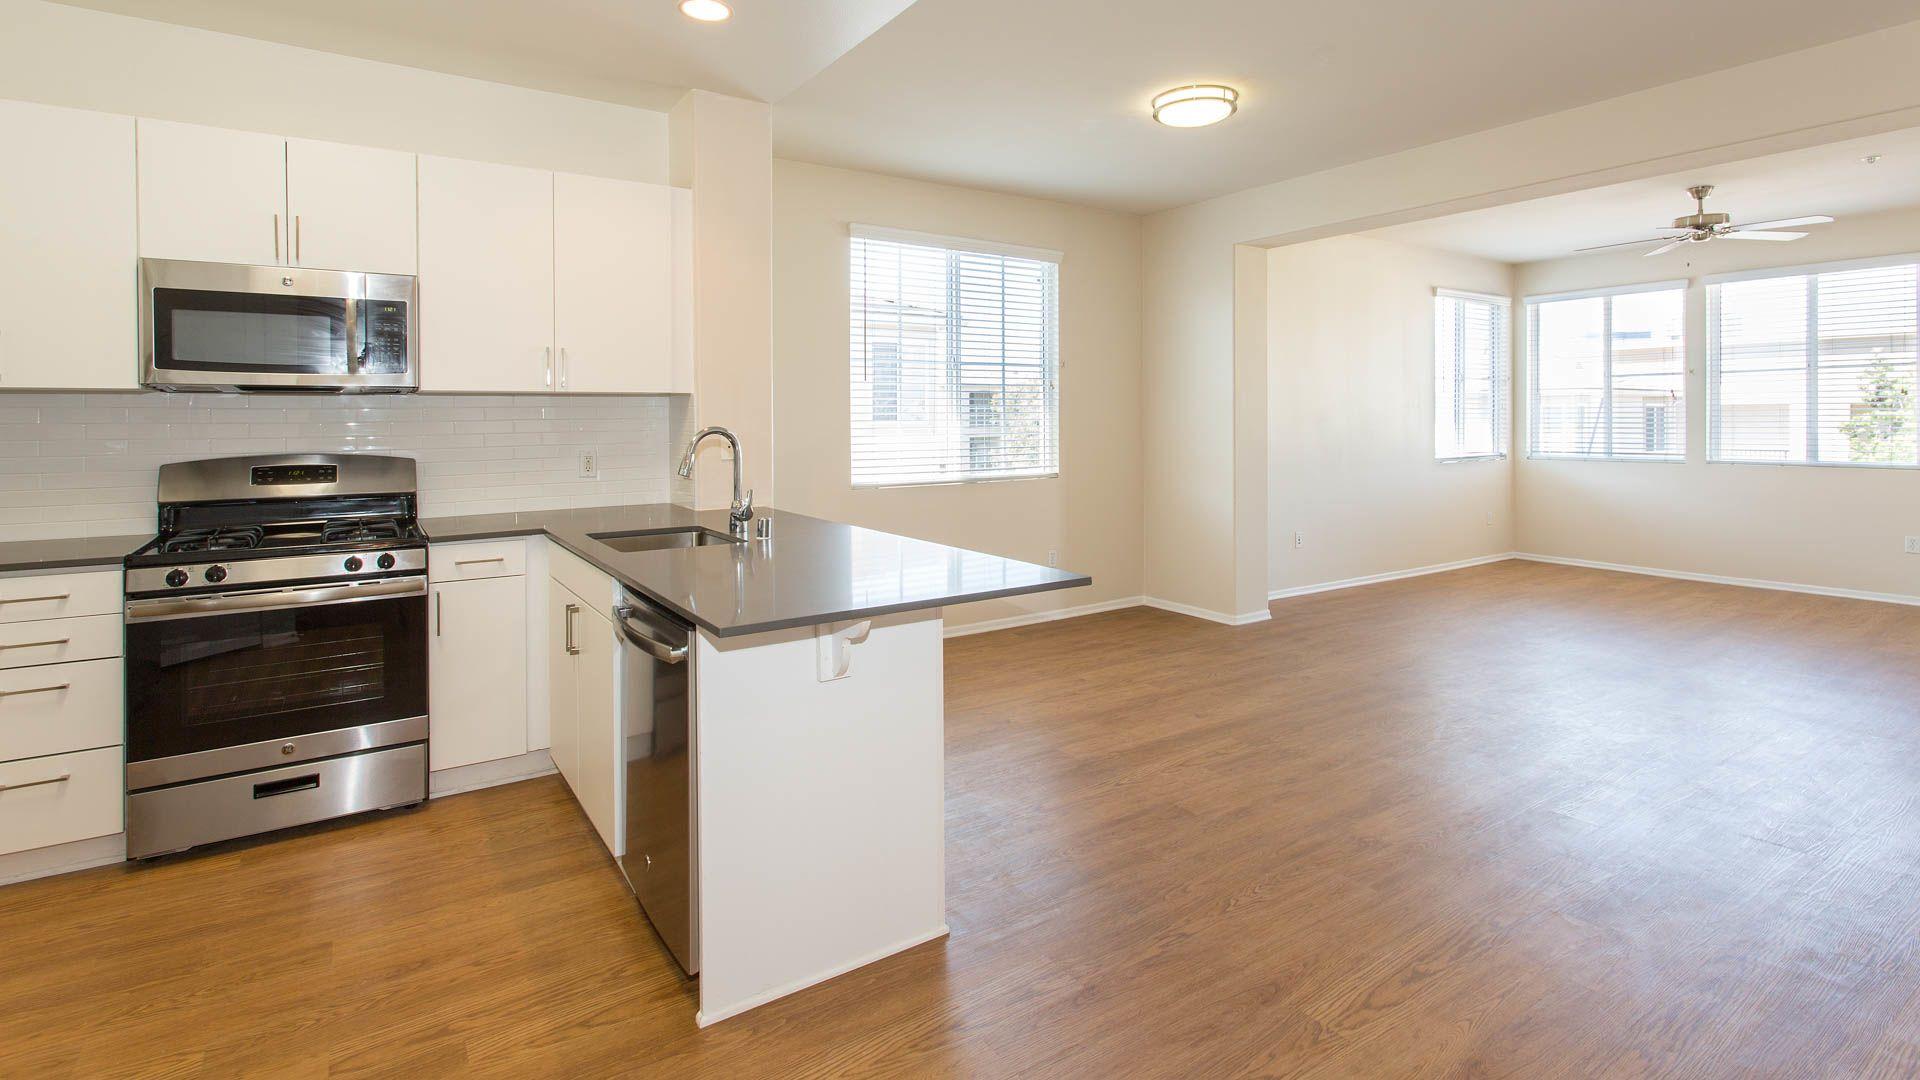 Bella Vista At Warner Ridge Apartments - Kitchen